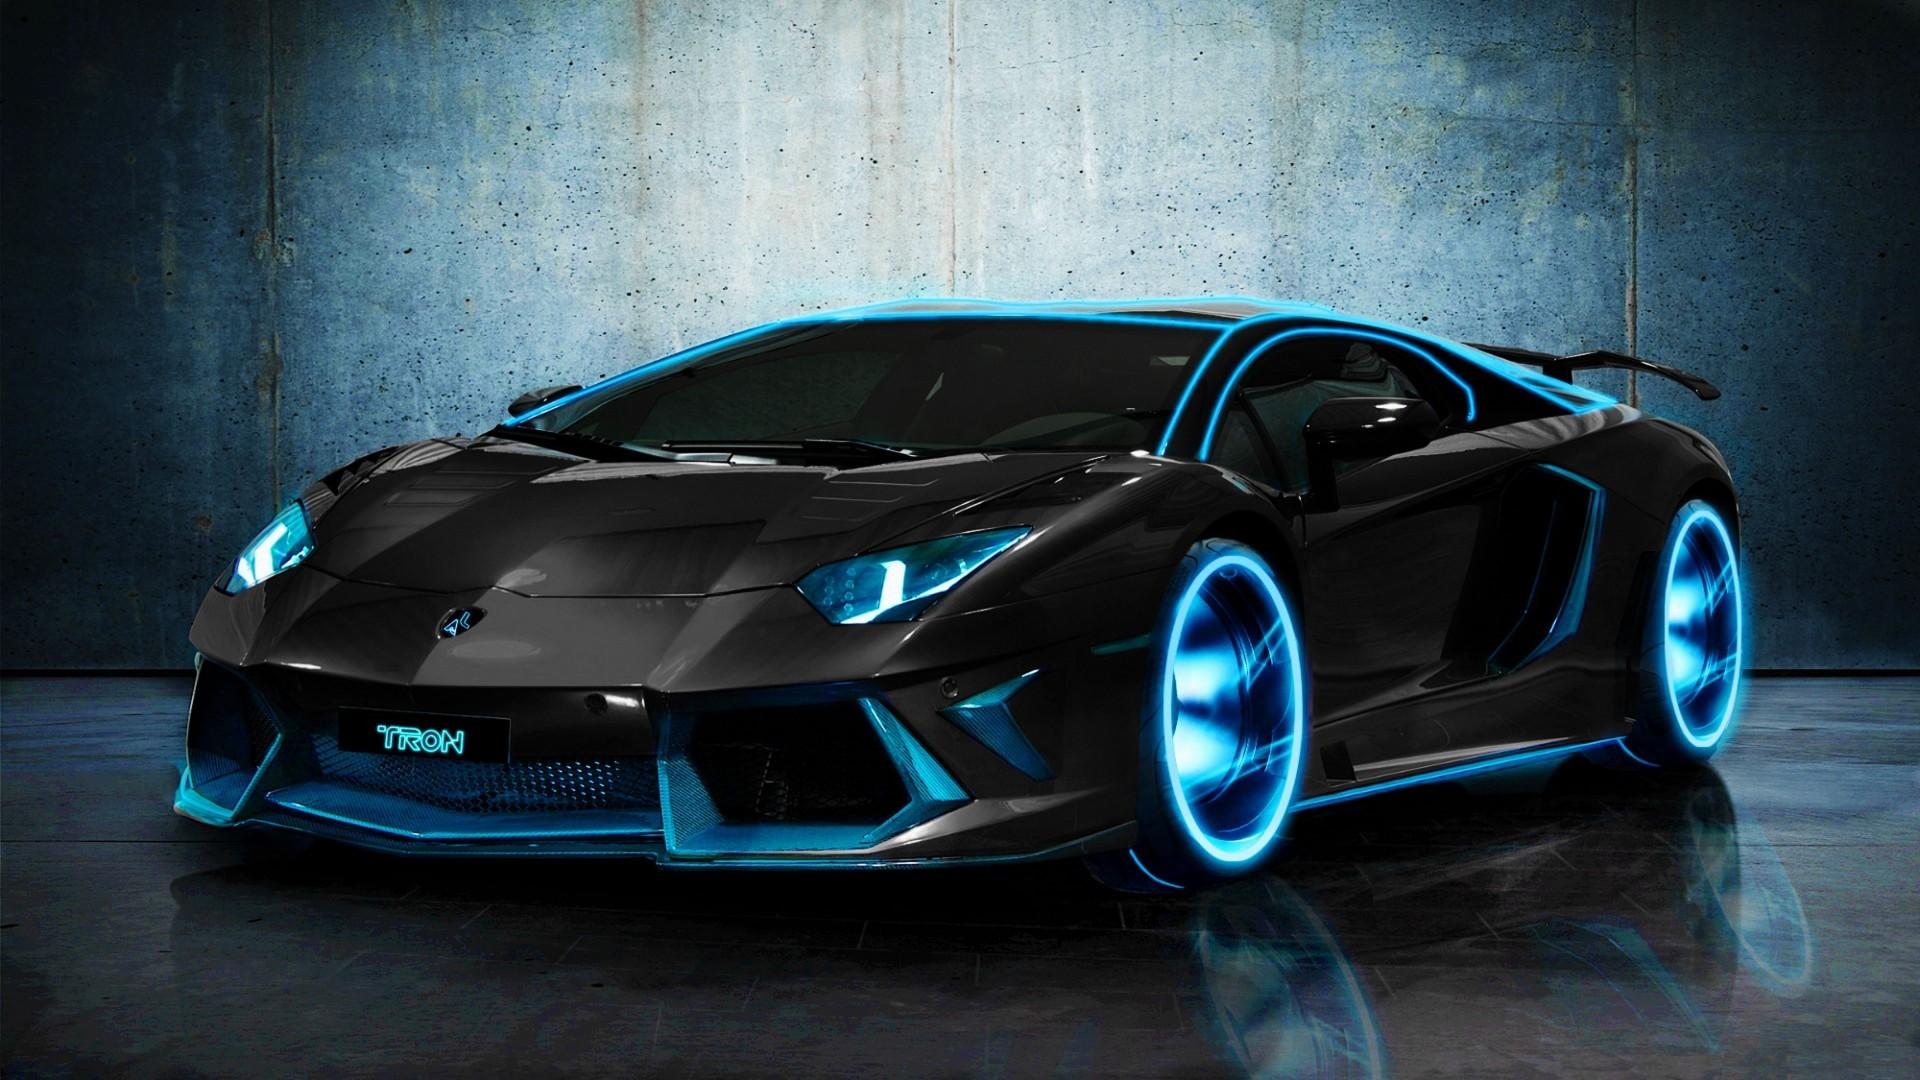 Perfect Car Vehicle Blue Lamborghini Lamborghini Aventador Black Cars Sports Car  Performance Car Wheel Supercar Land Vehicle